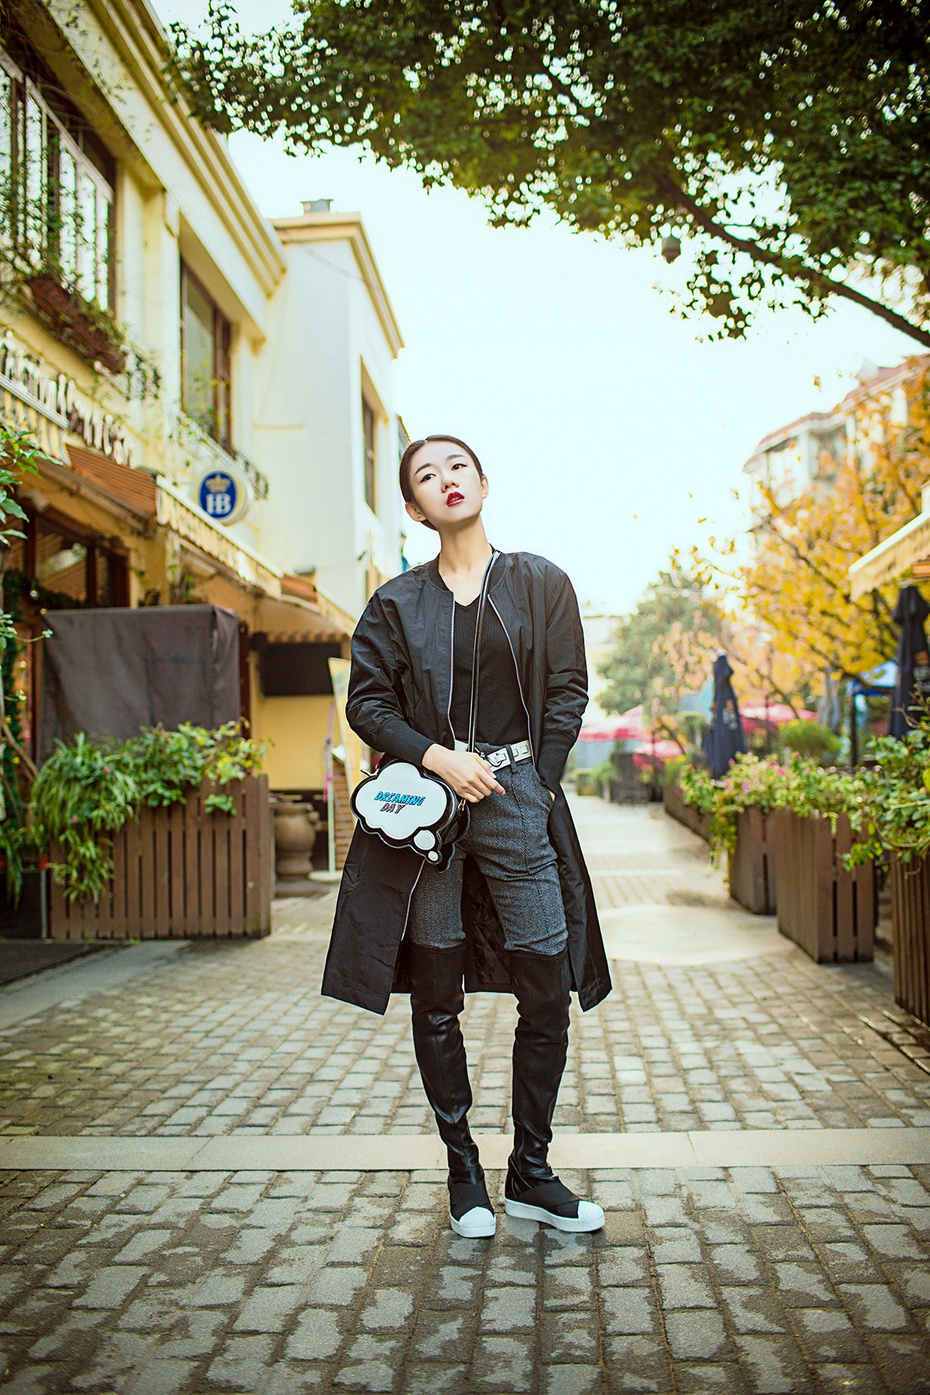 [Ava搭配周记]不一样的我 - AvaFoo - Avas Fashion Blog